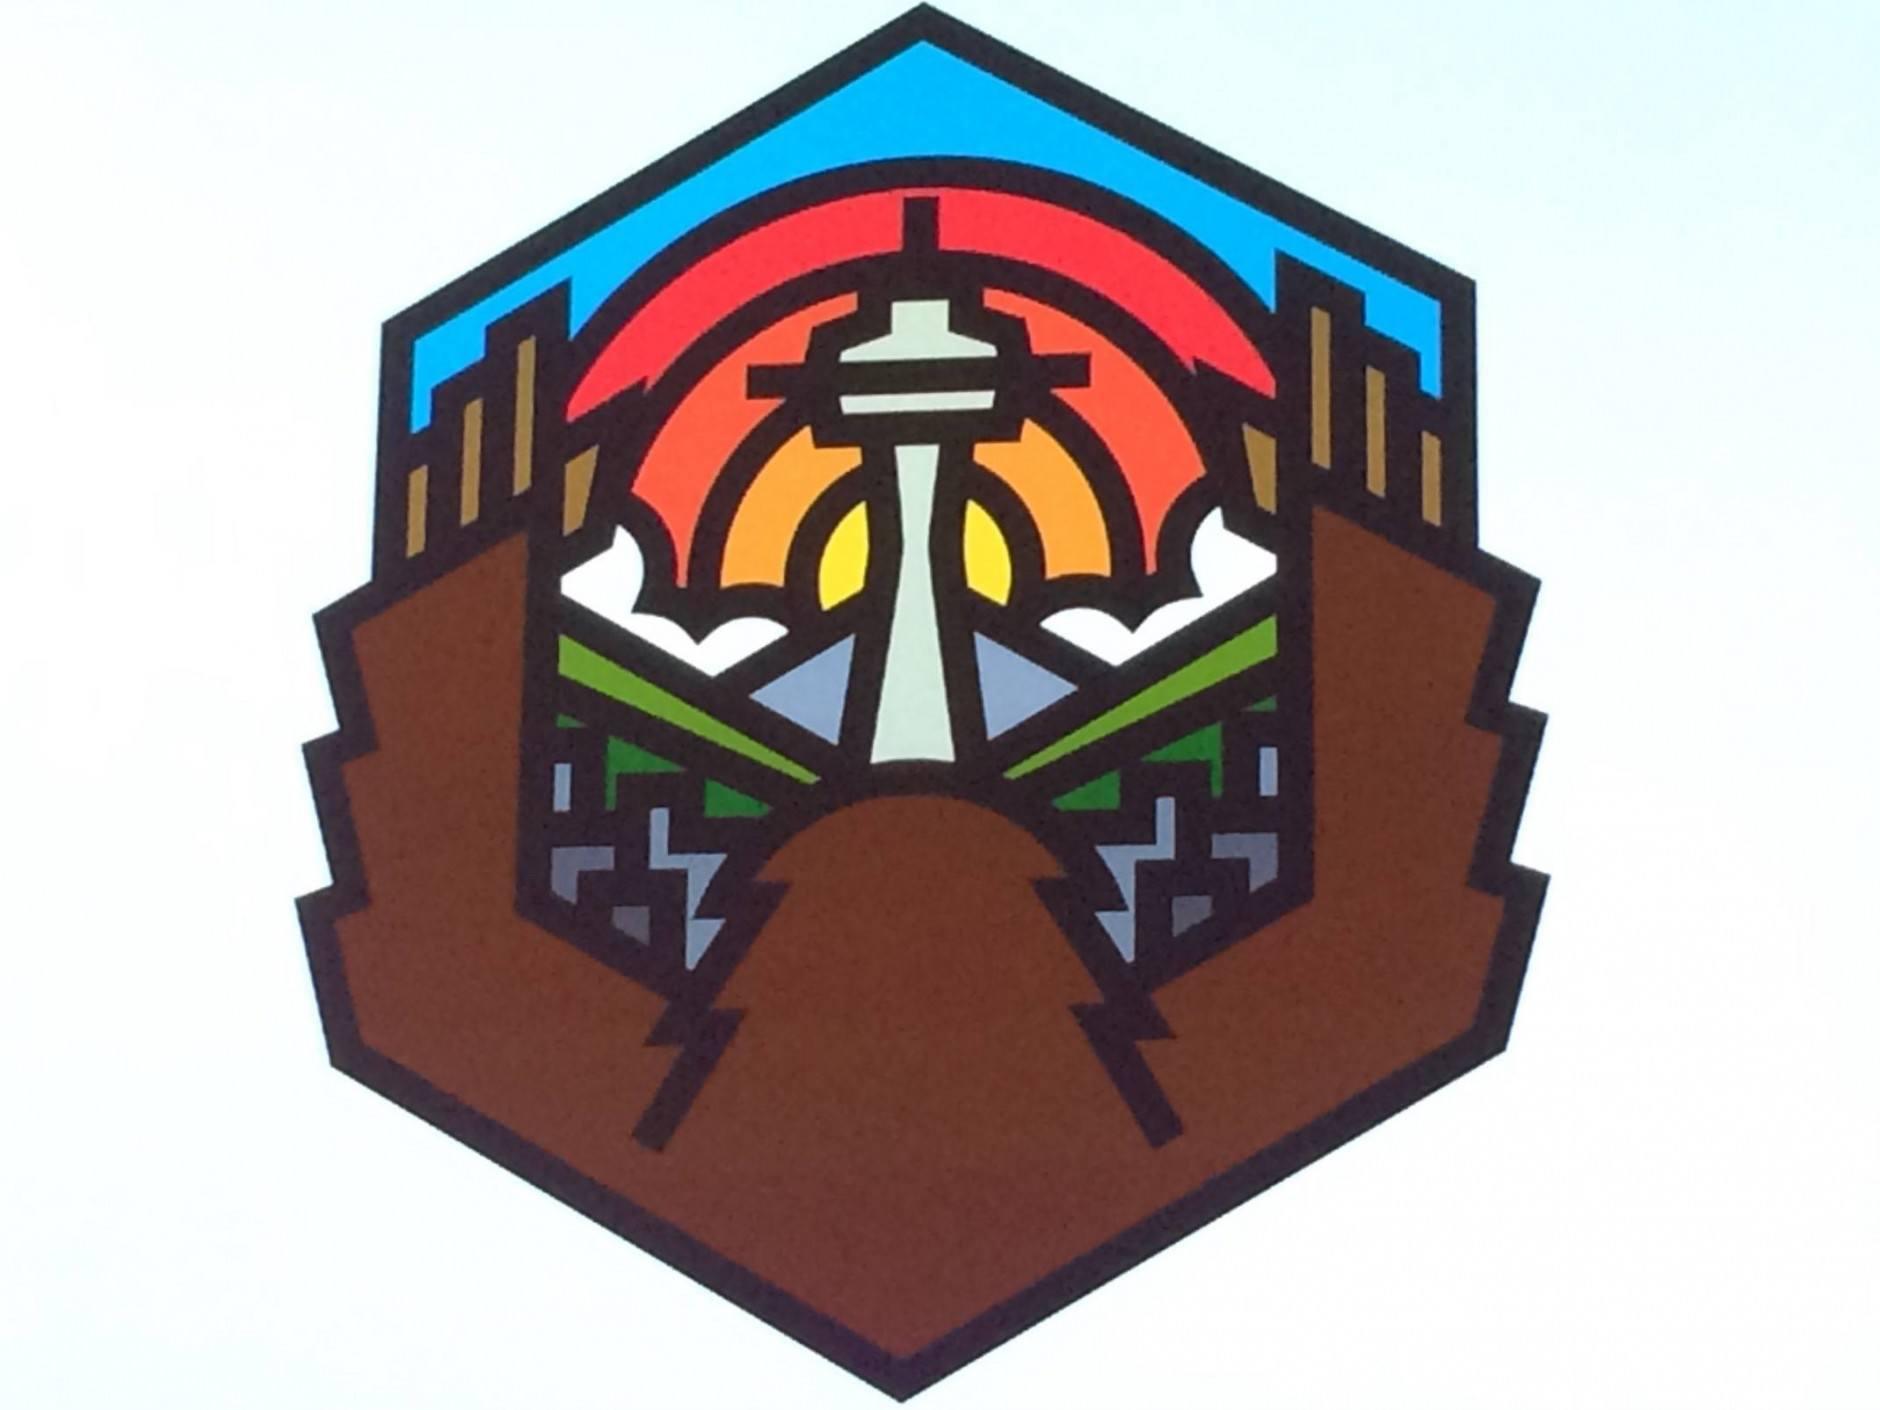 Geniales Logo-Design von Aaron James Draplin